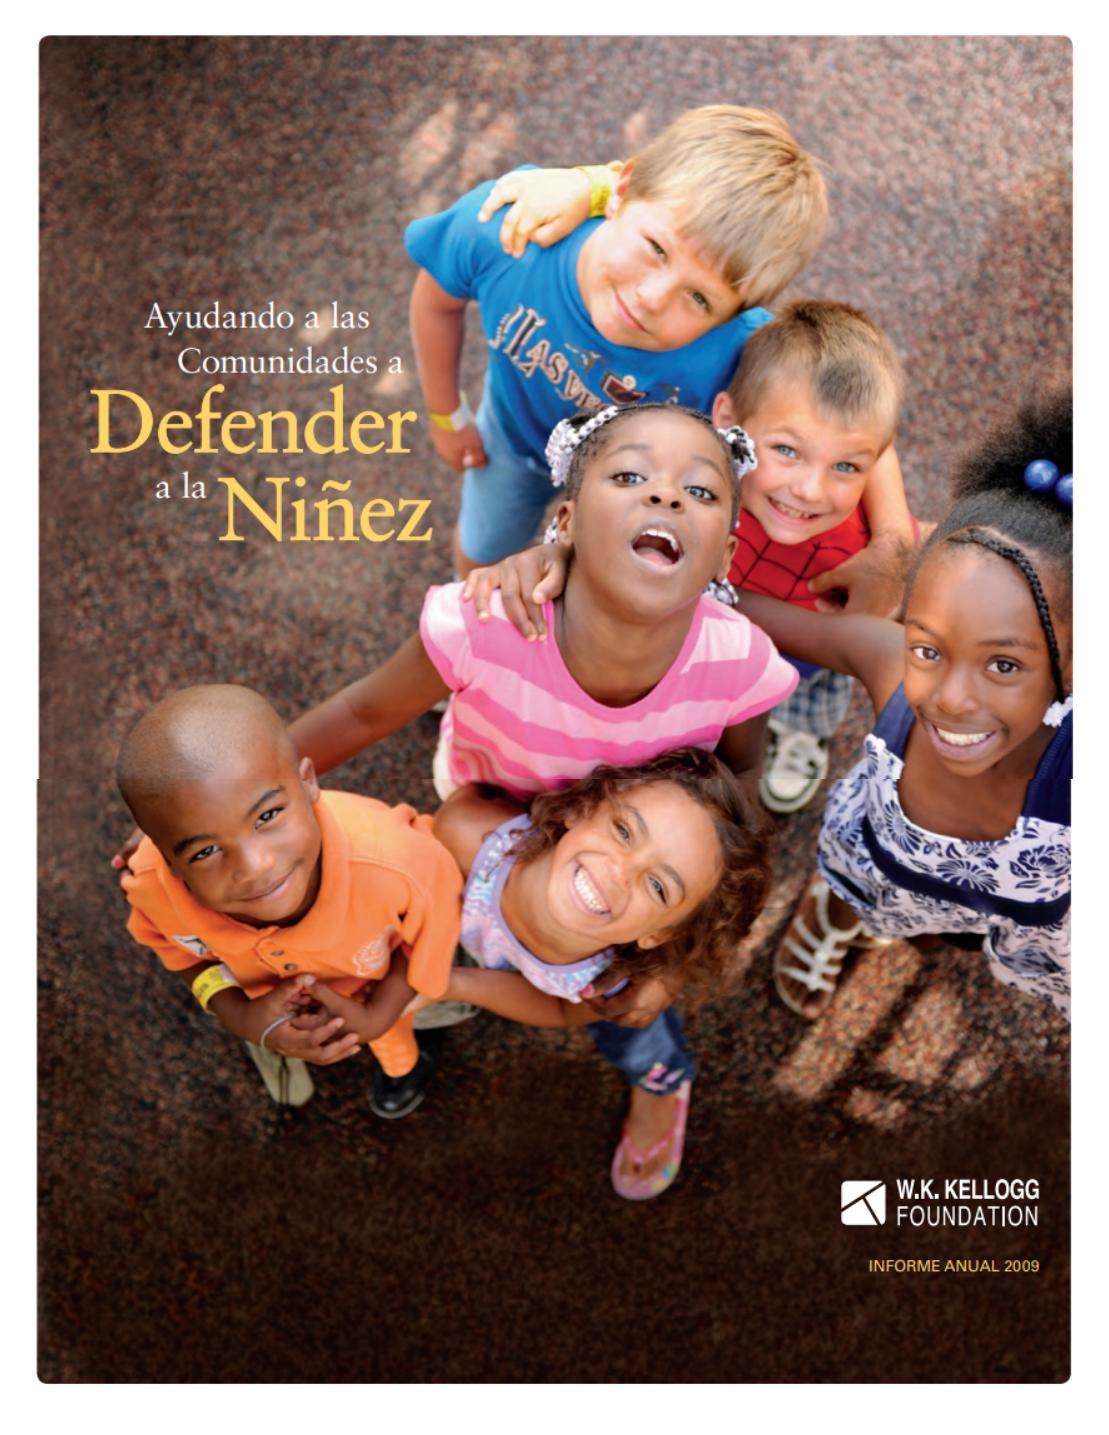 Ayudando a las Comunidades a Defender a la Niñez, 2009 W.K. Kellogg Foundation Annual Report